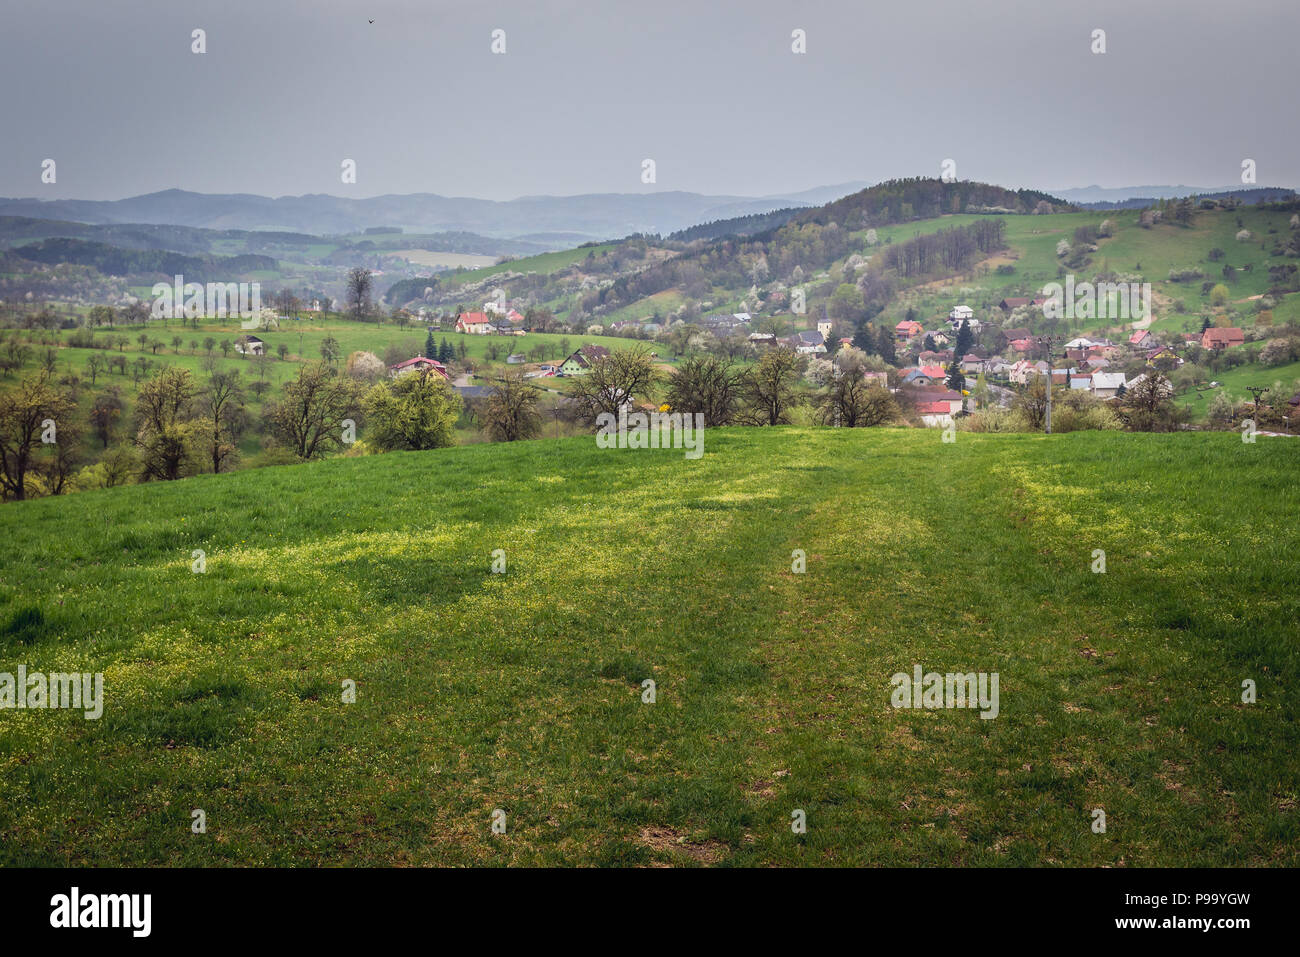 Jasenna village in Zlin Region, Moravia in Czech Republic - Stock Image